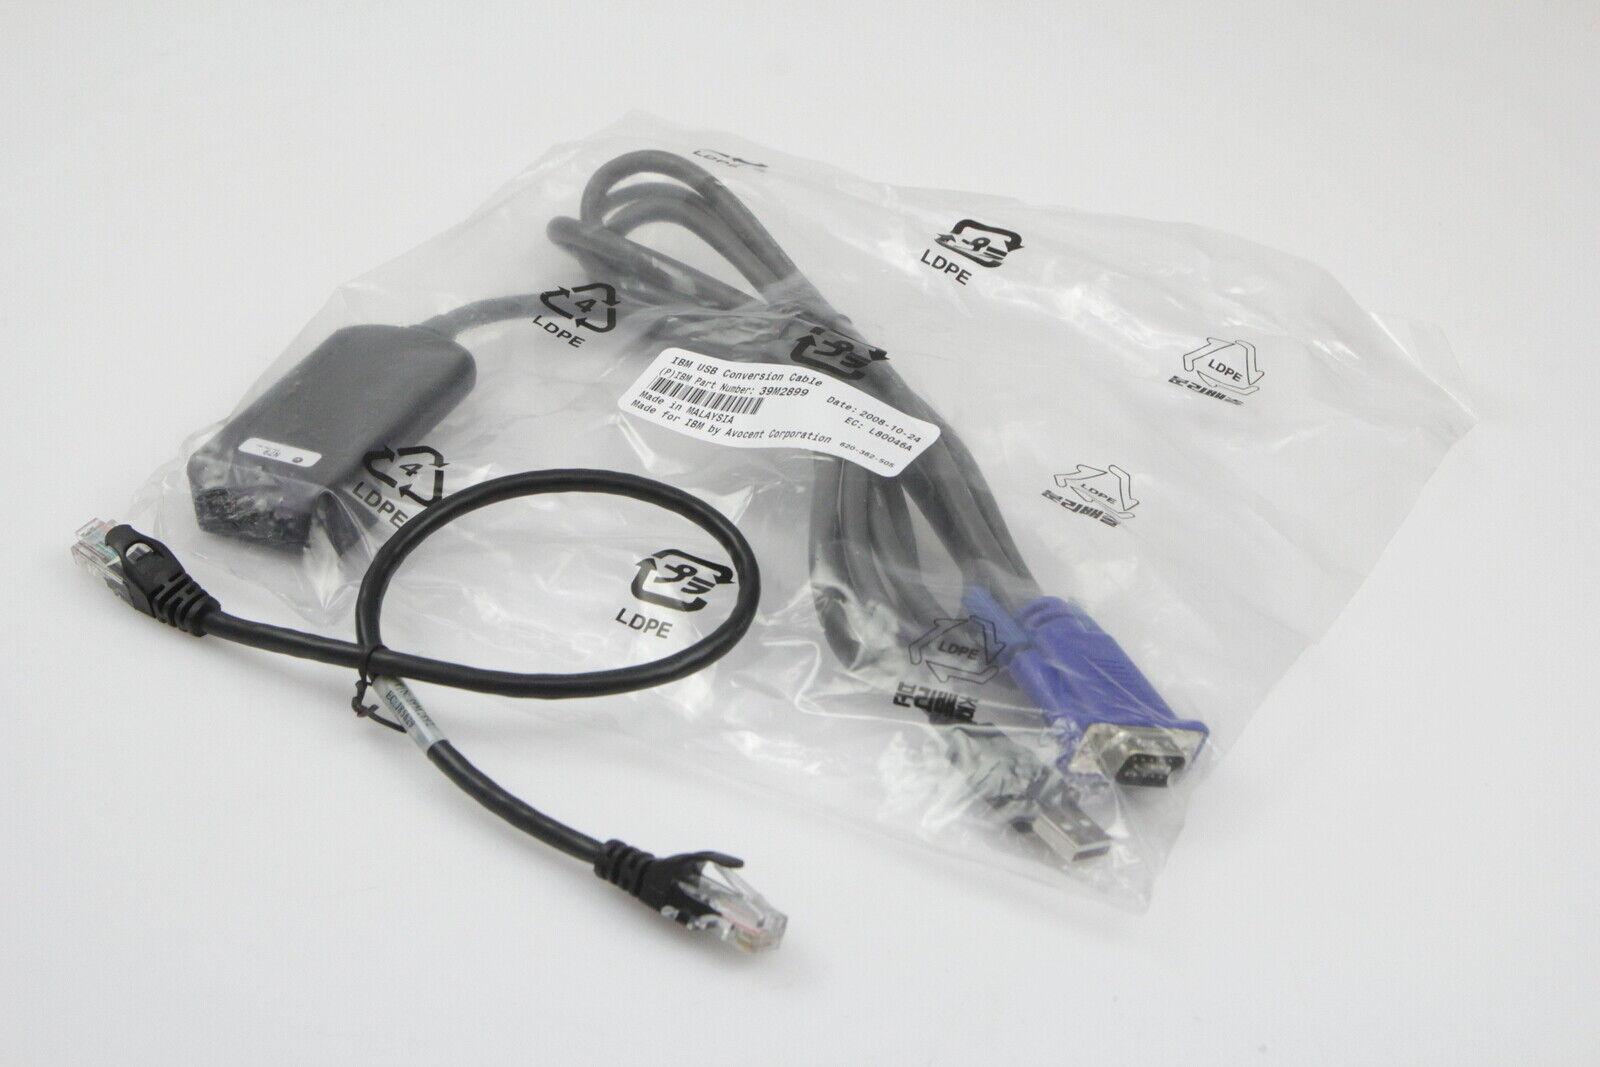 Genuine IBM USB 250mm KVM Switch RCM Conversion Cable Module SIP 39M2899 39M2909